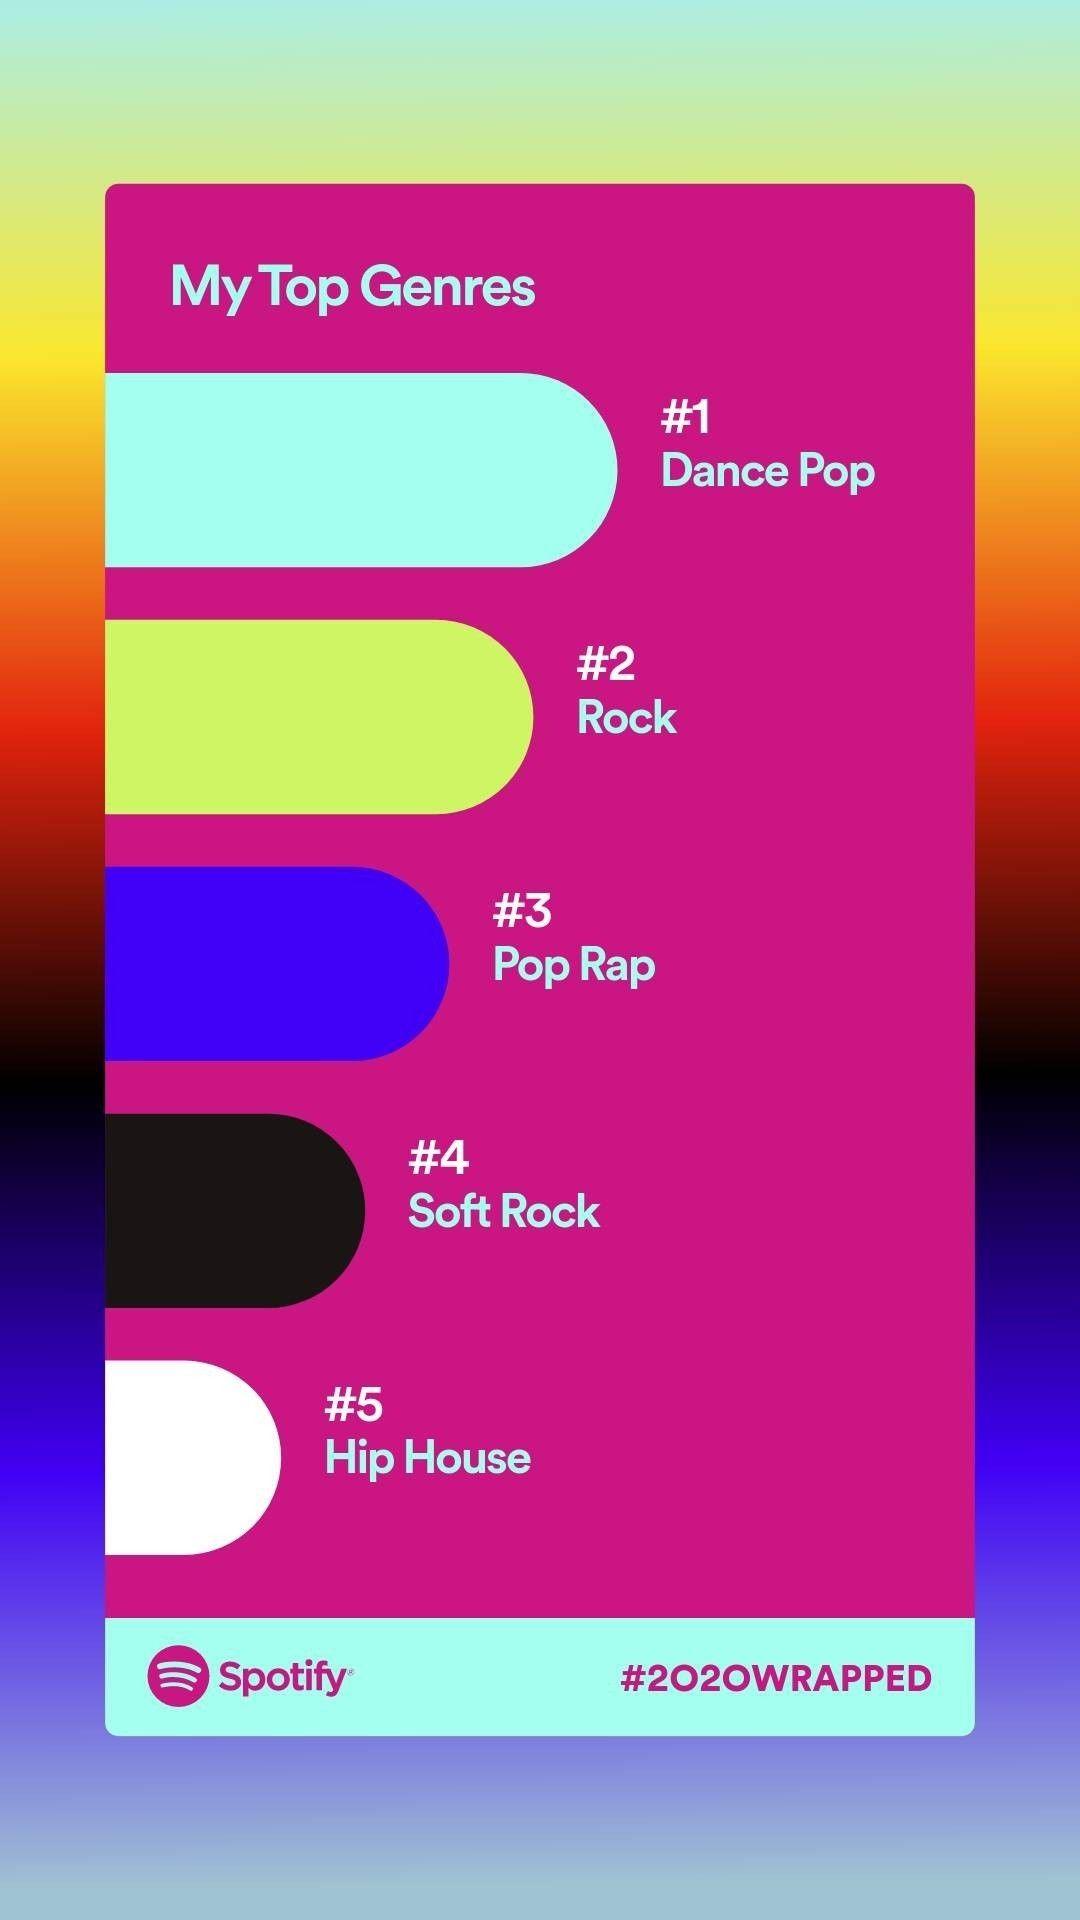 My Top Genres Spotify2020 Spotify Alternative Hip Hop Pop Dance